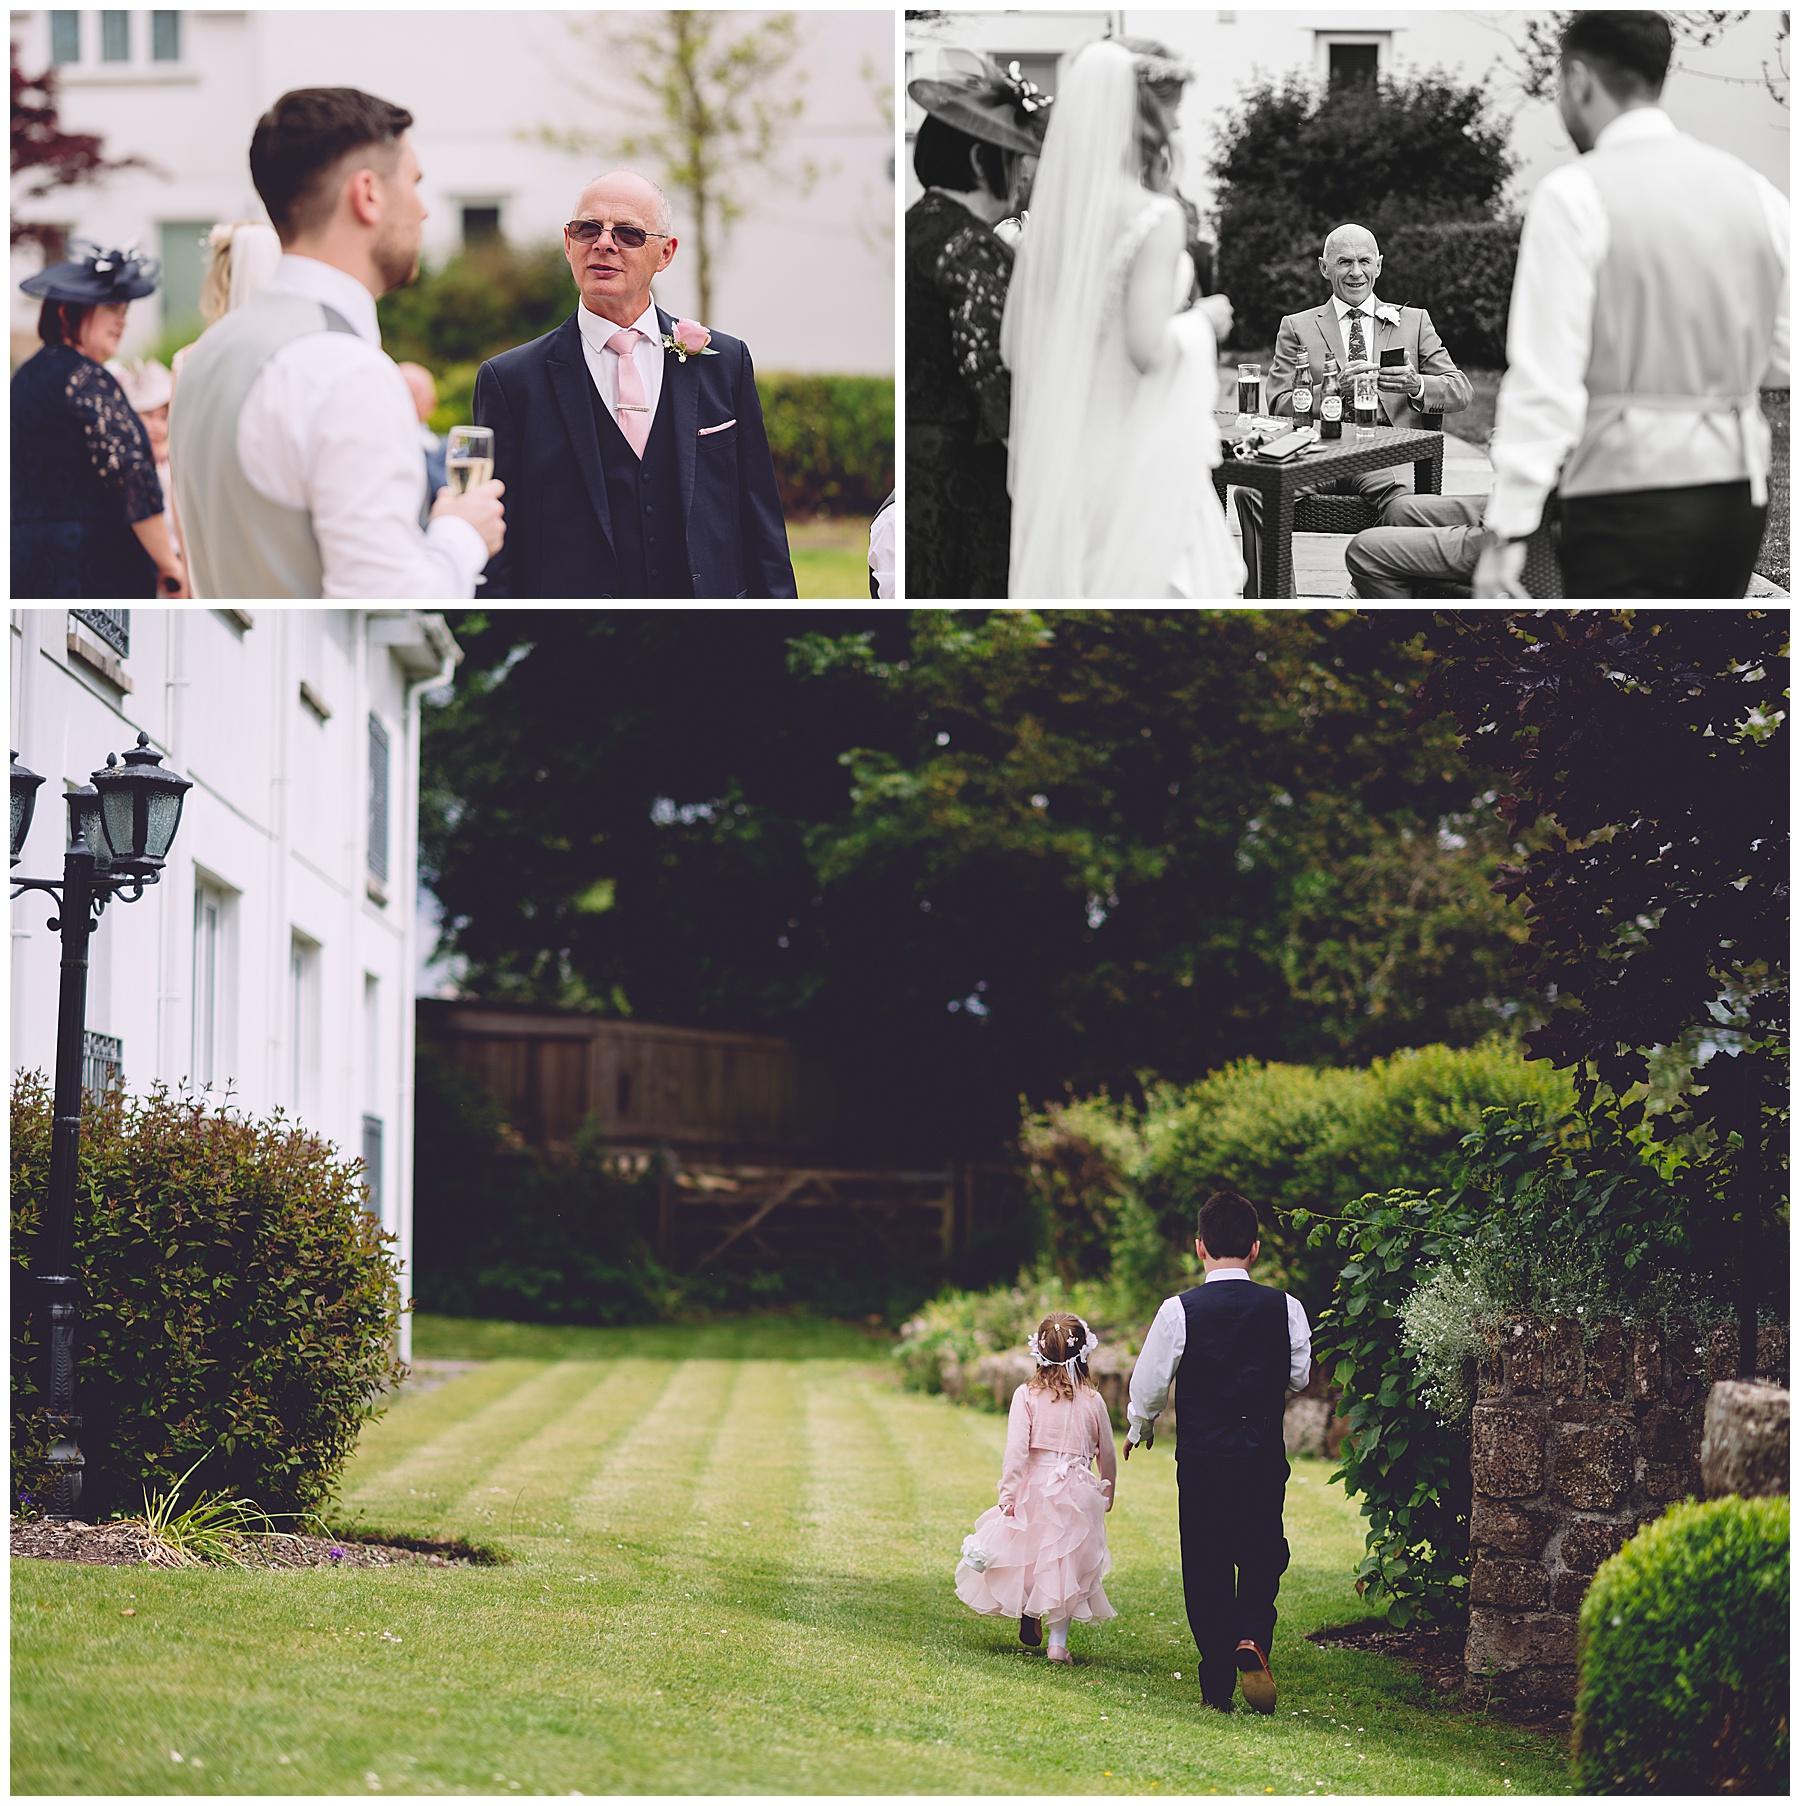 King Arthur Wedding Guests